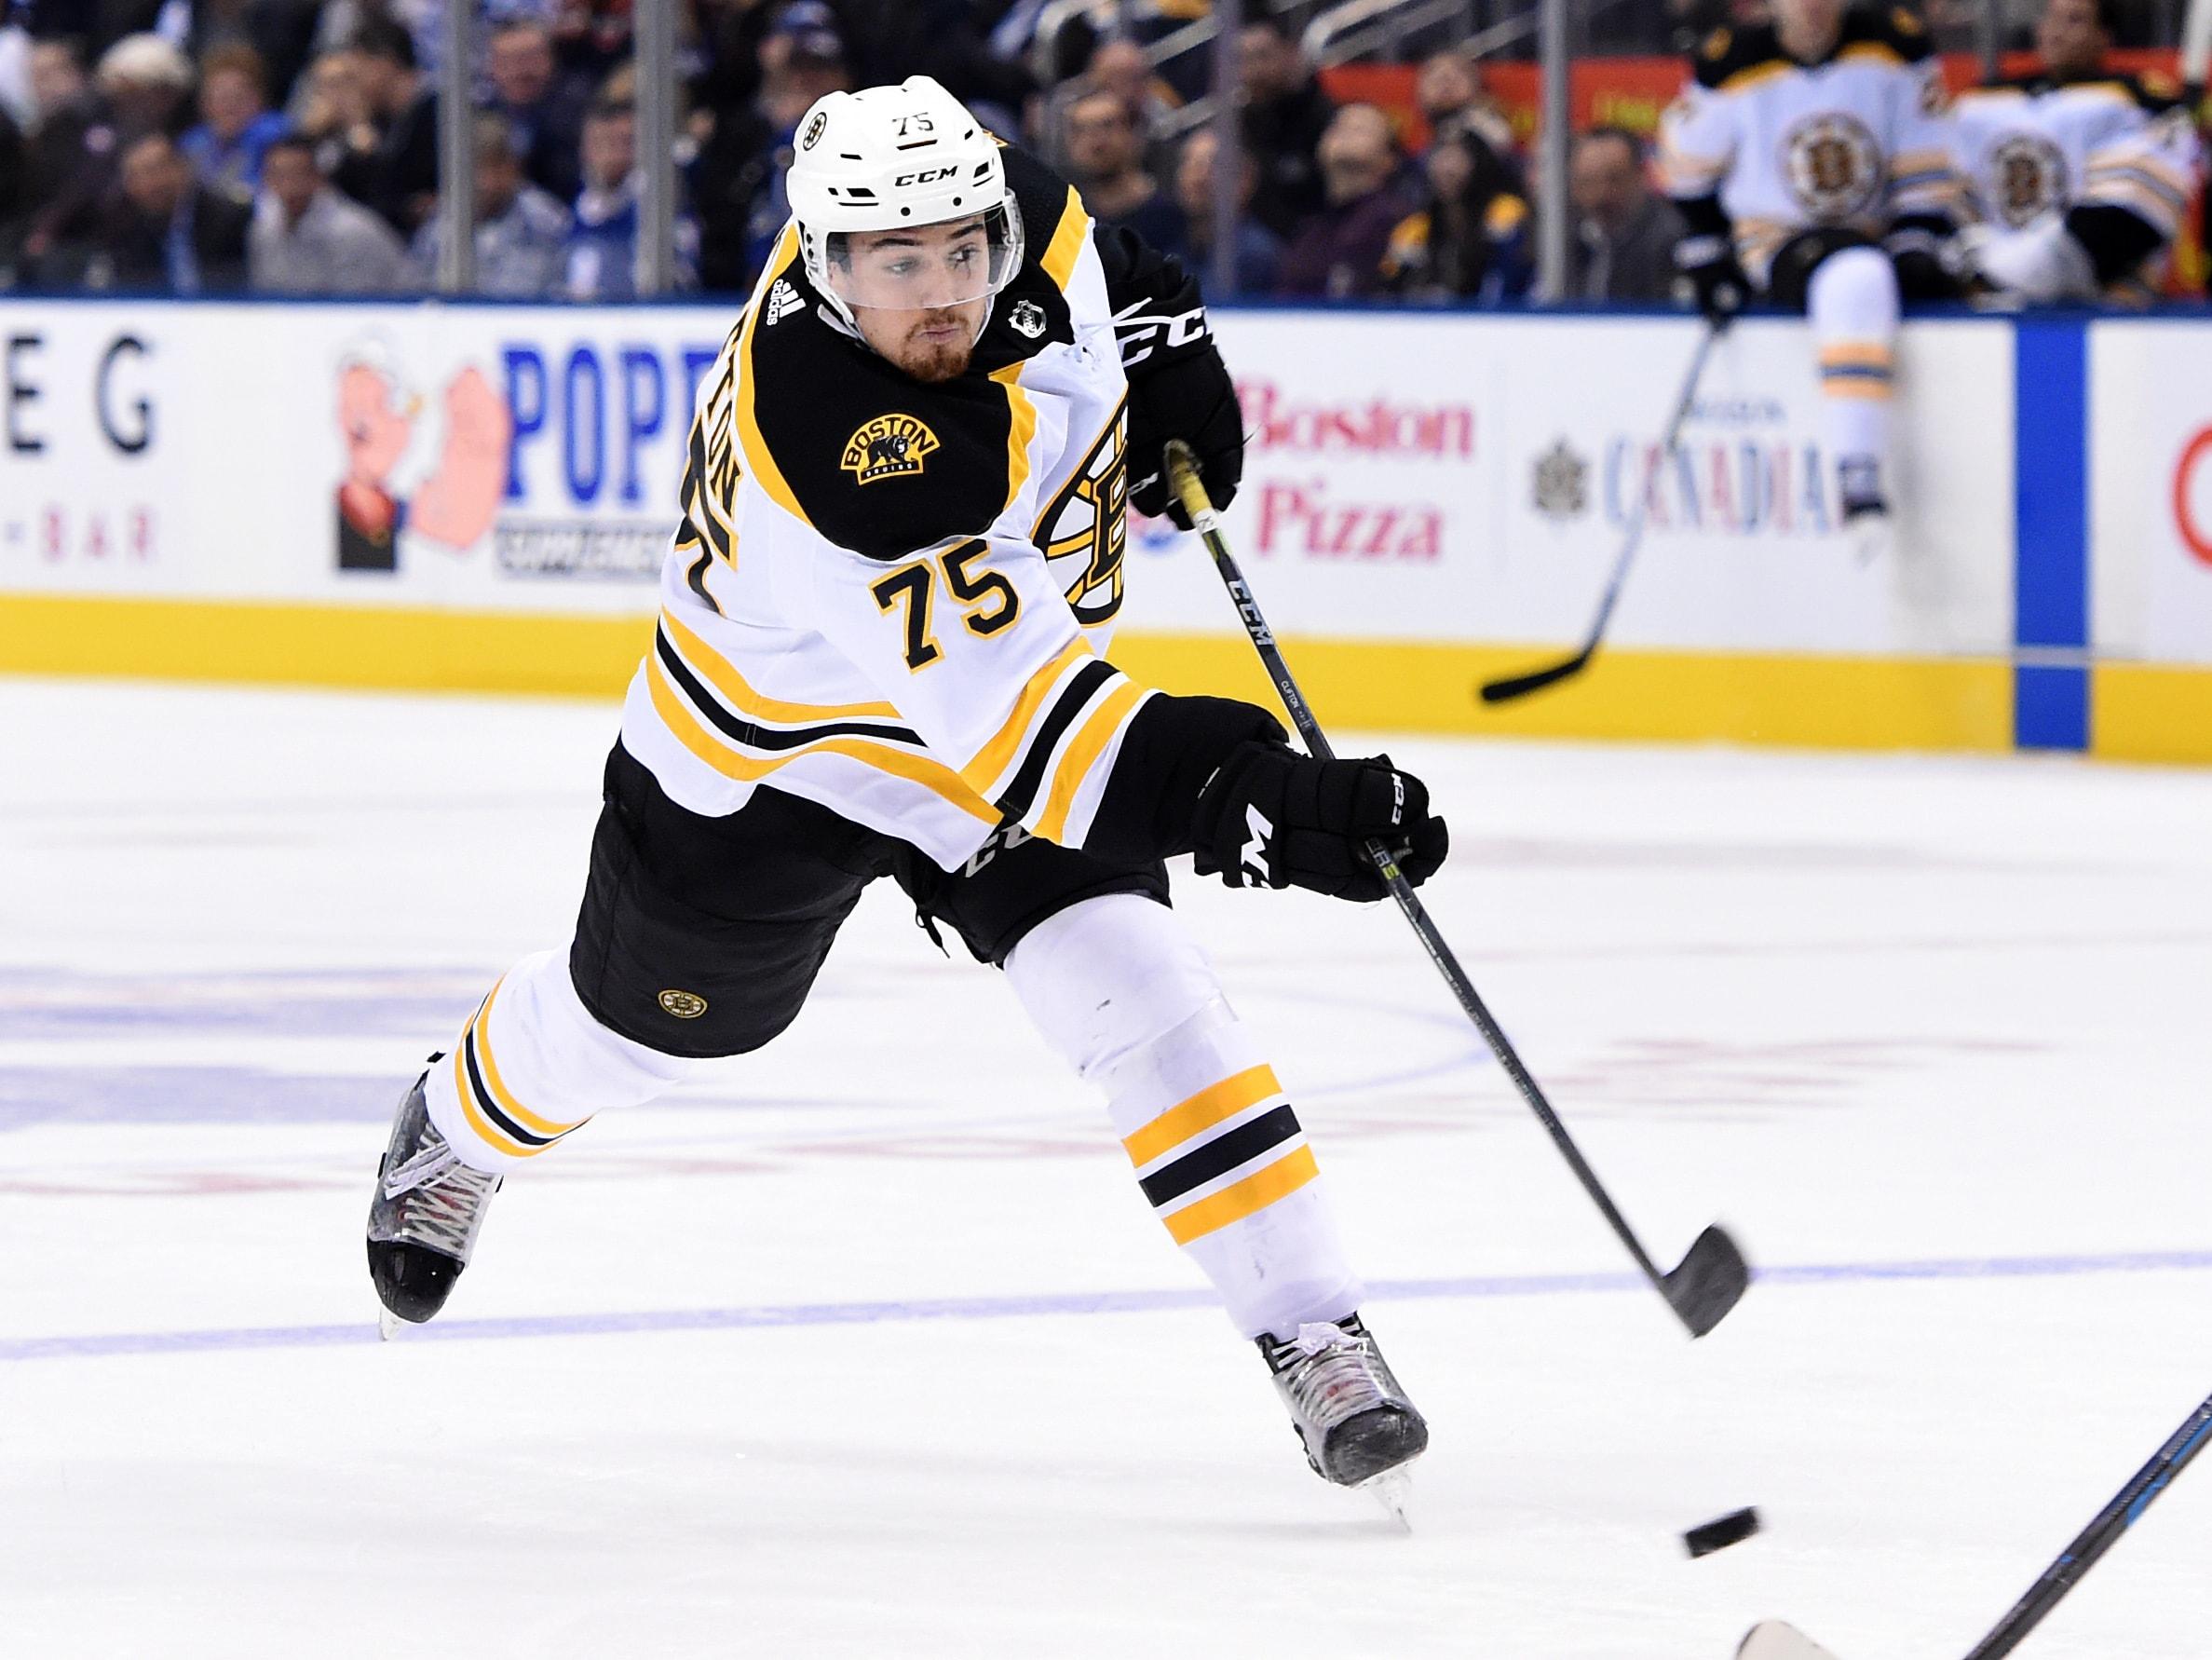 26. novembra 2018;  Toronto, Ontário: Obranca Bostonu Bruins Connor Clifton zasiahol v prvom polčase v Scotiabank Arene loptu proti Torontu Maple Leafs.  (Dan Hamilton - USA Today Sports)